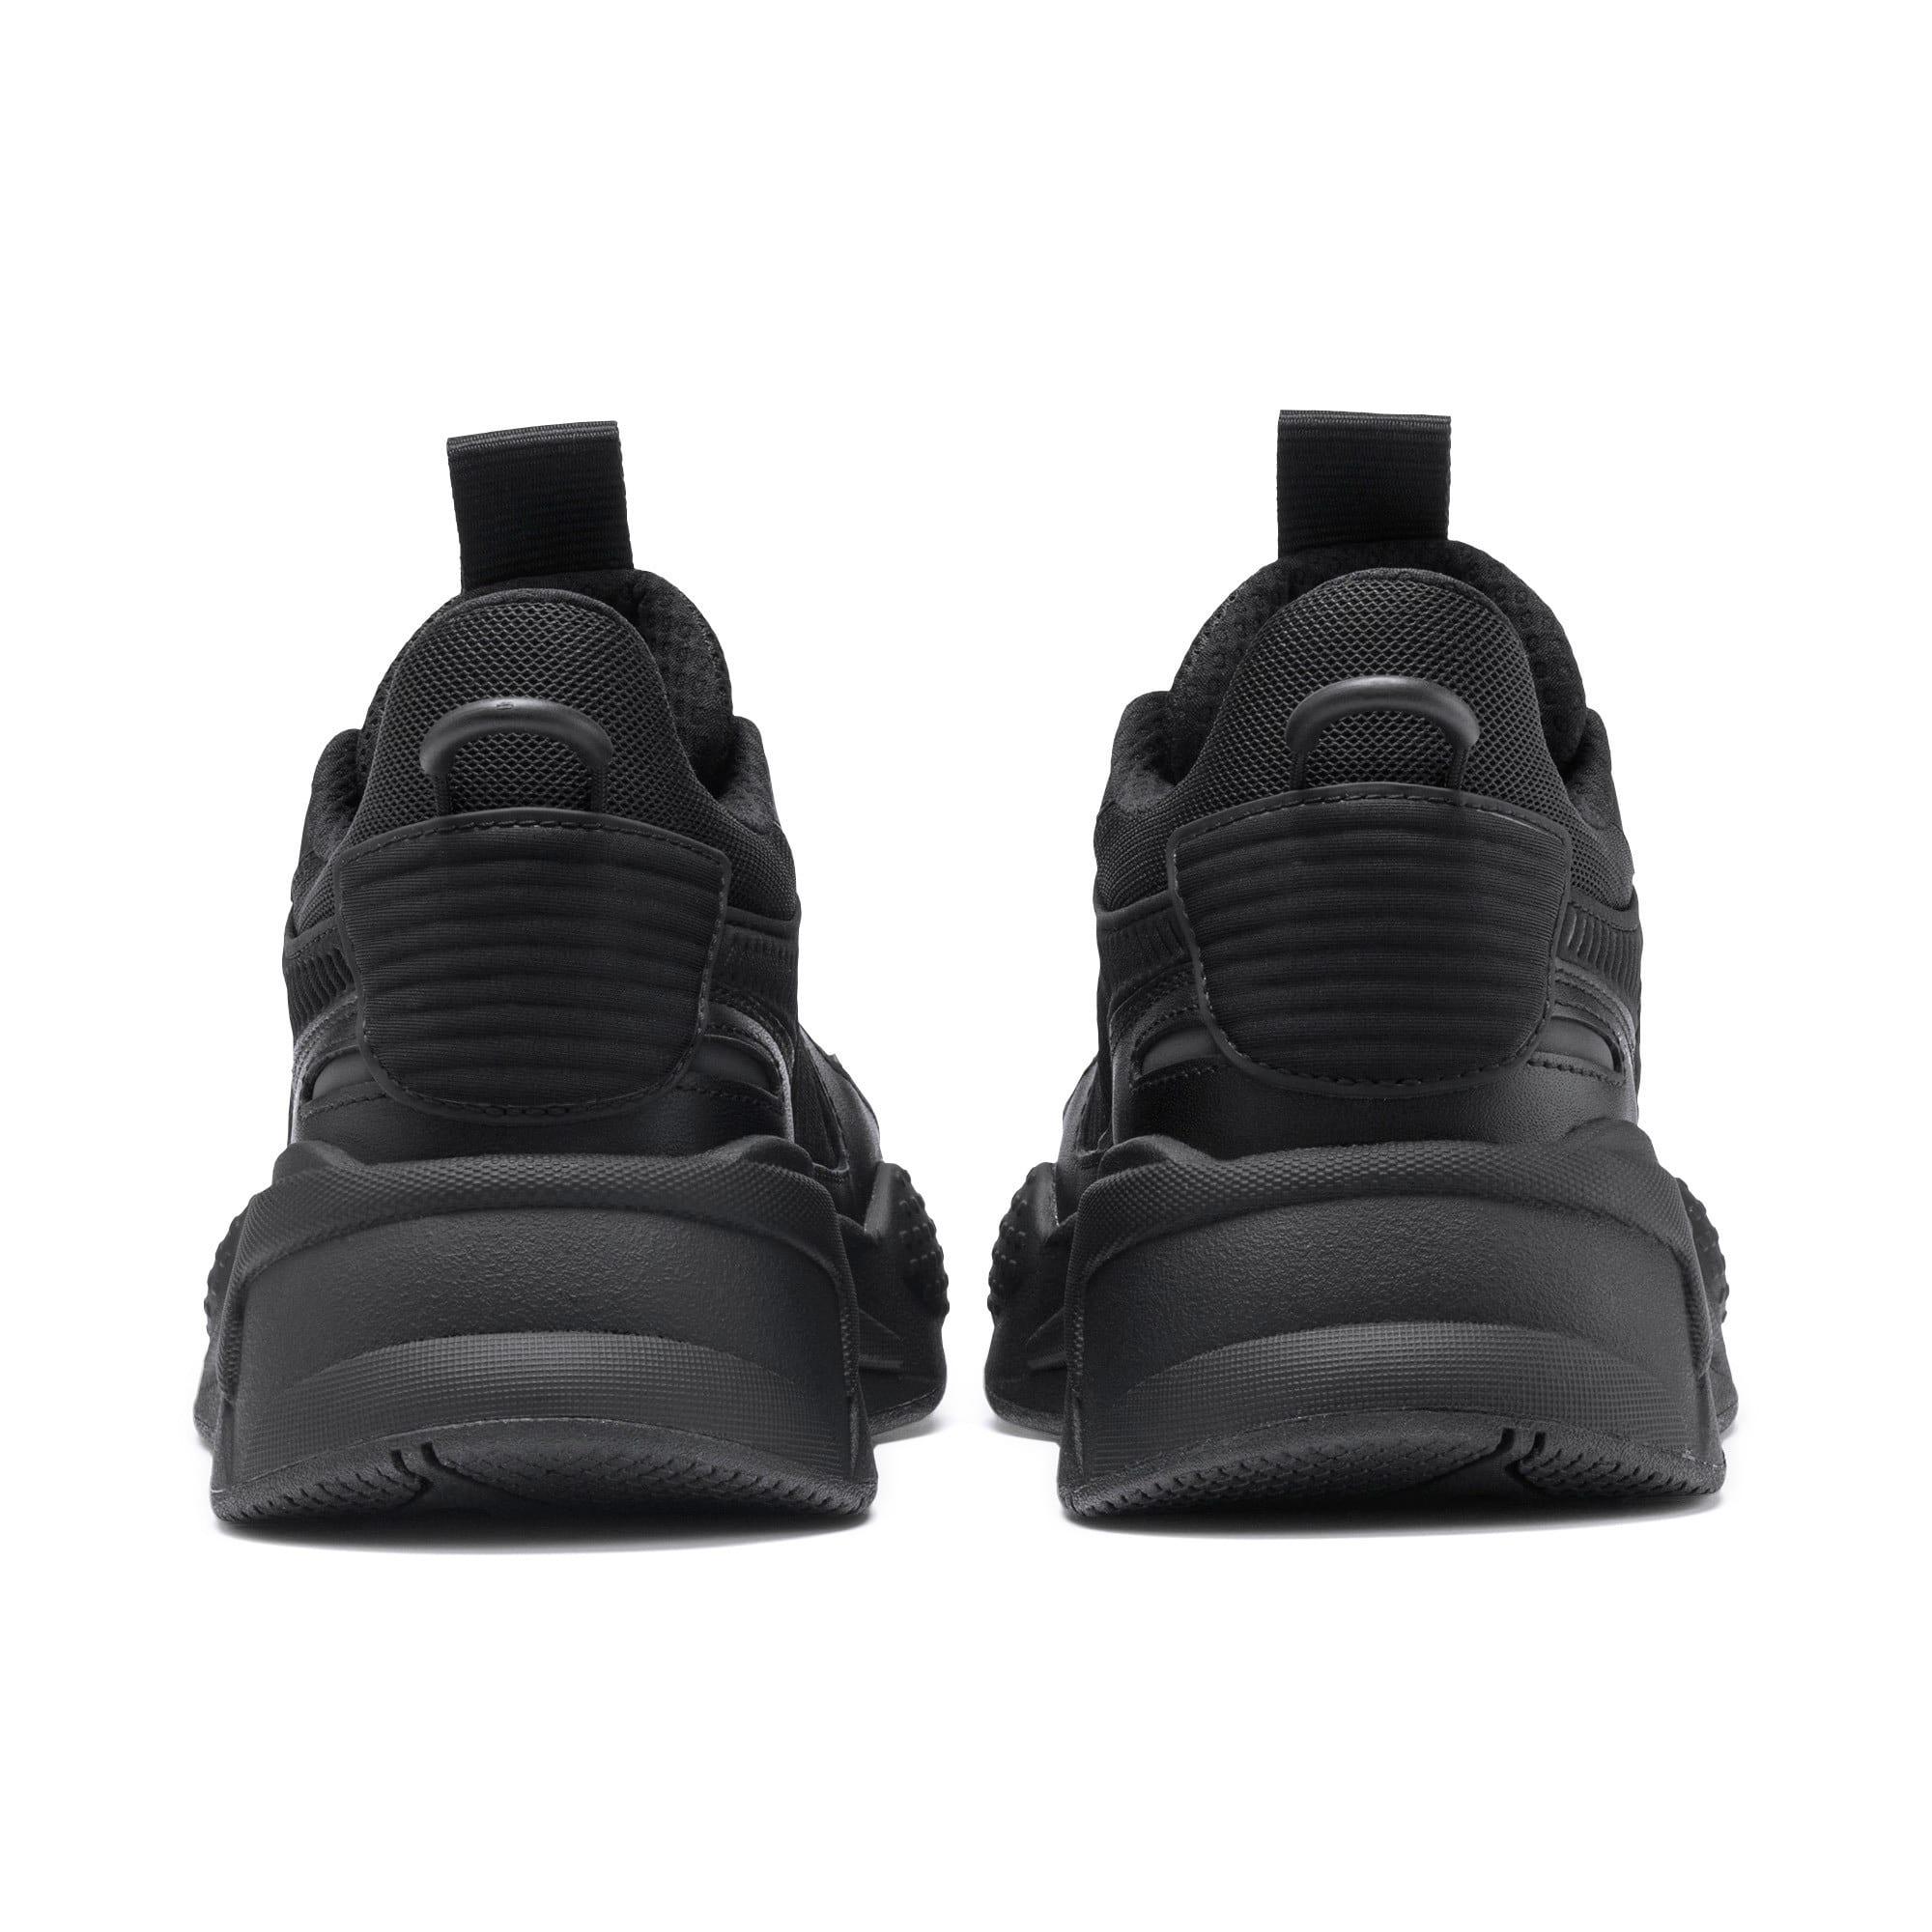 Thumbnail 3 of RS-X Sneaker, Puma Black-Puma Black, medium